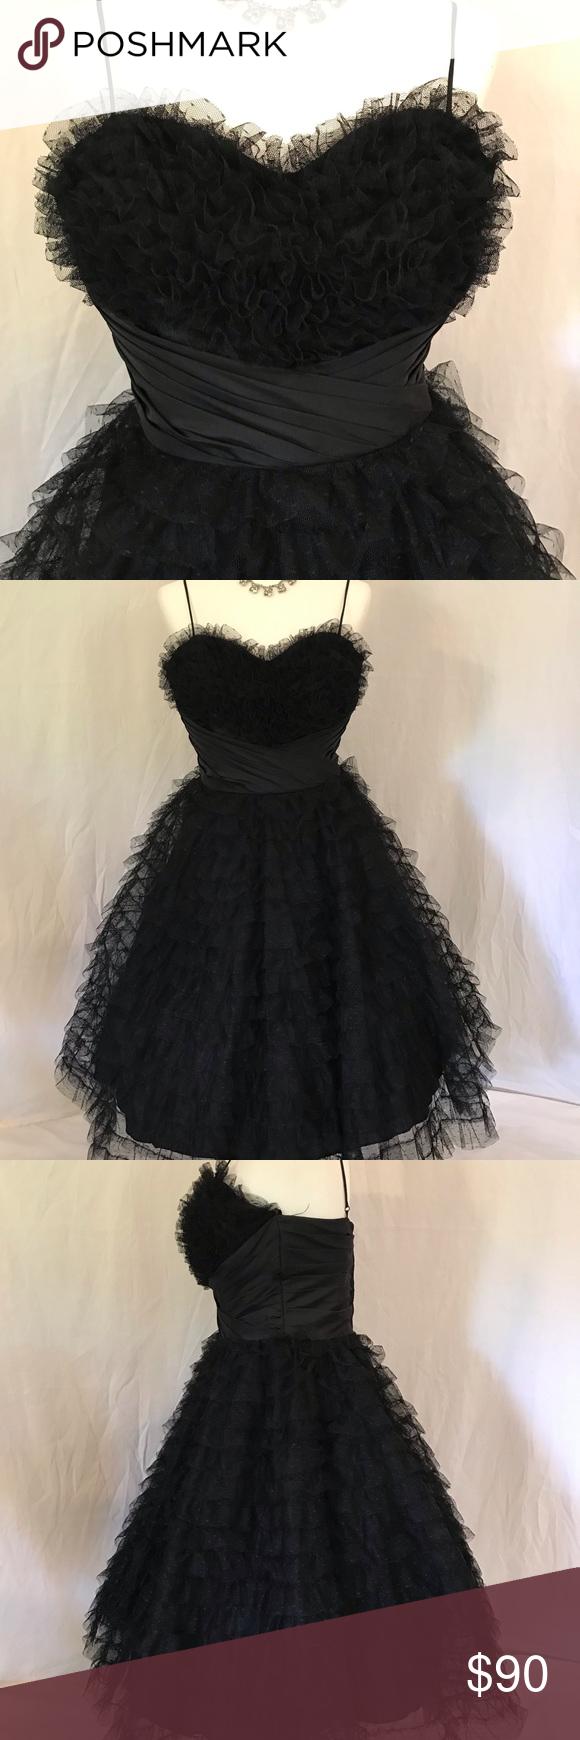 Unique Vintage Black Tulle Sweetheart Swing Dress Swing Dress Unique Vintage Dresses Colorful Dresses [ 1740 x 580 Pixel ]